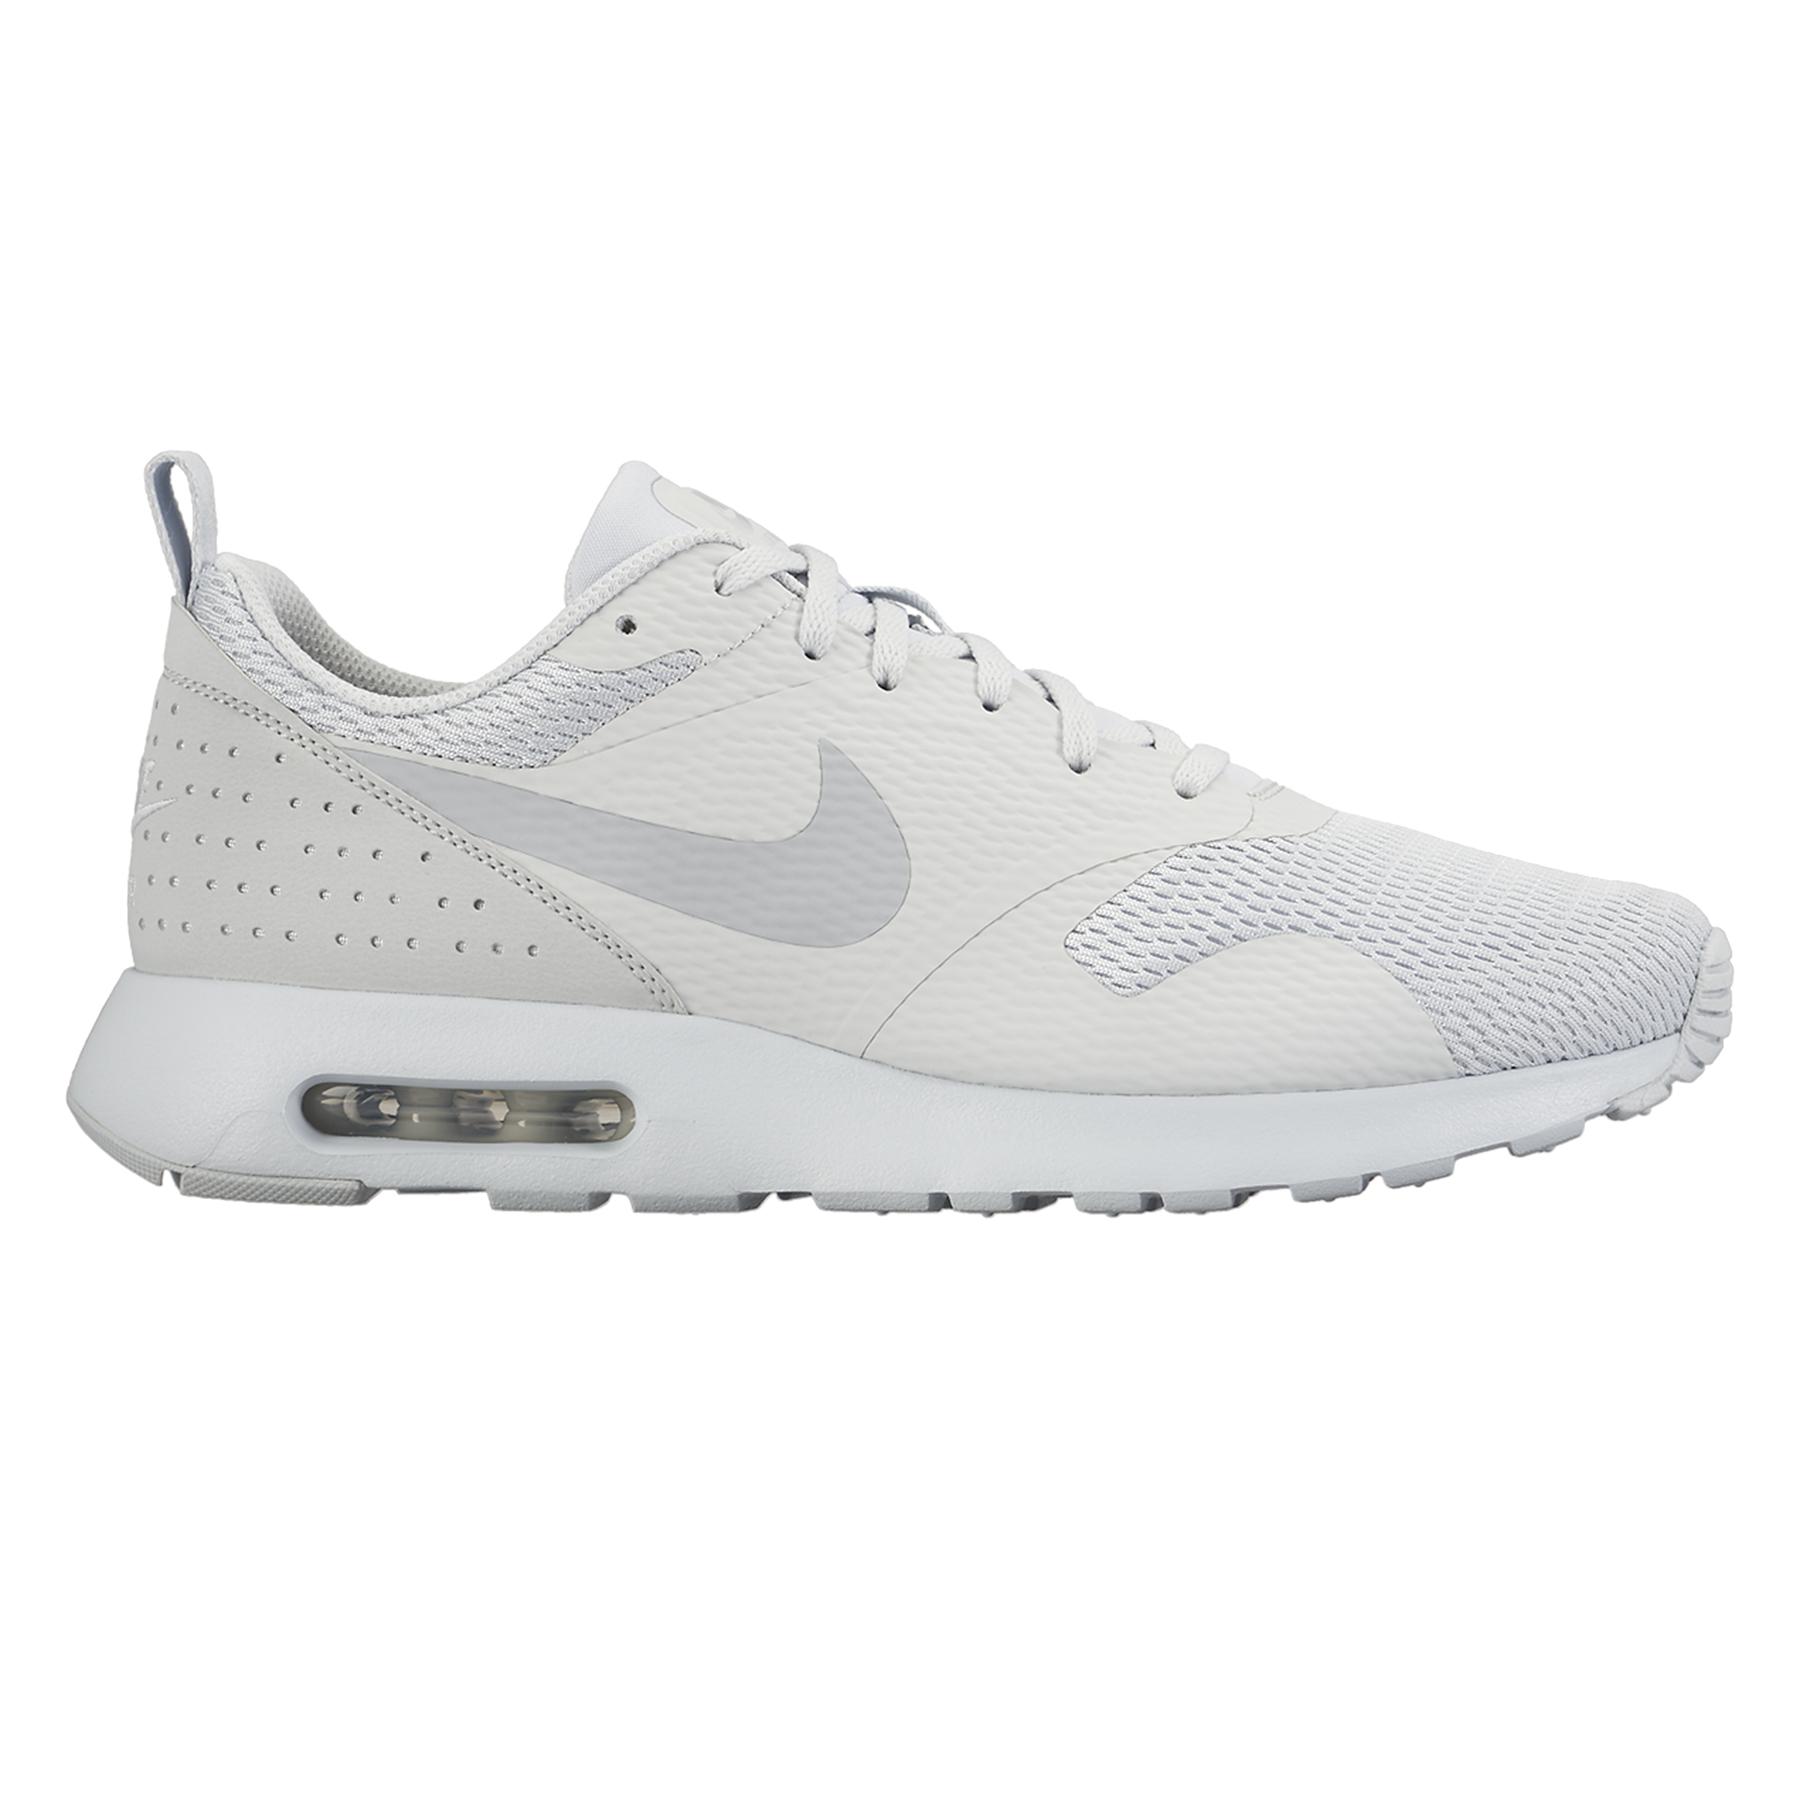 Nike Air Max Tavas Trainers Grey